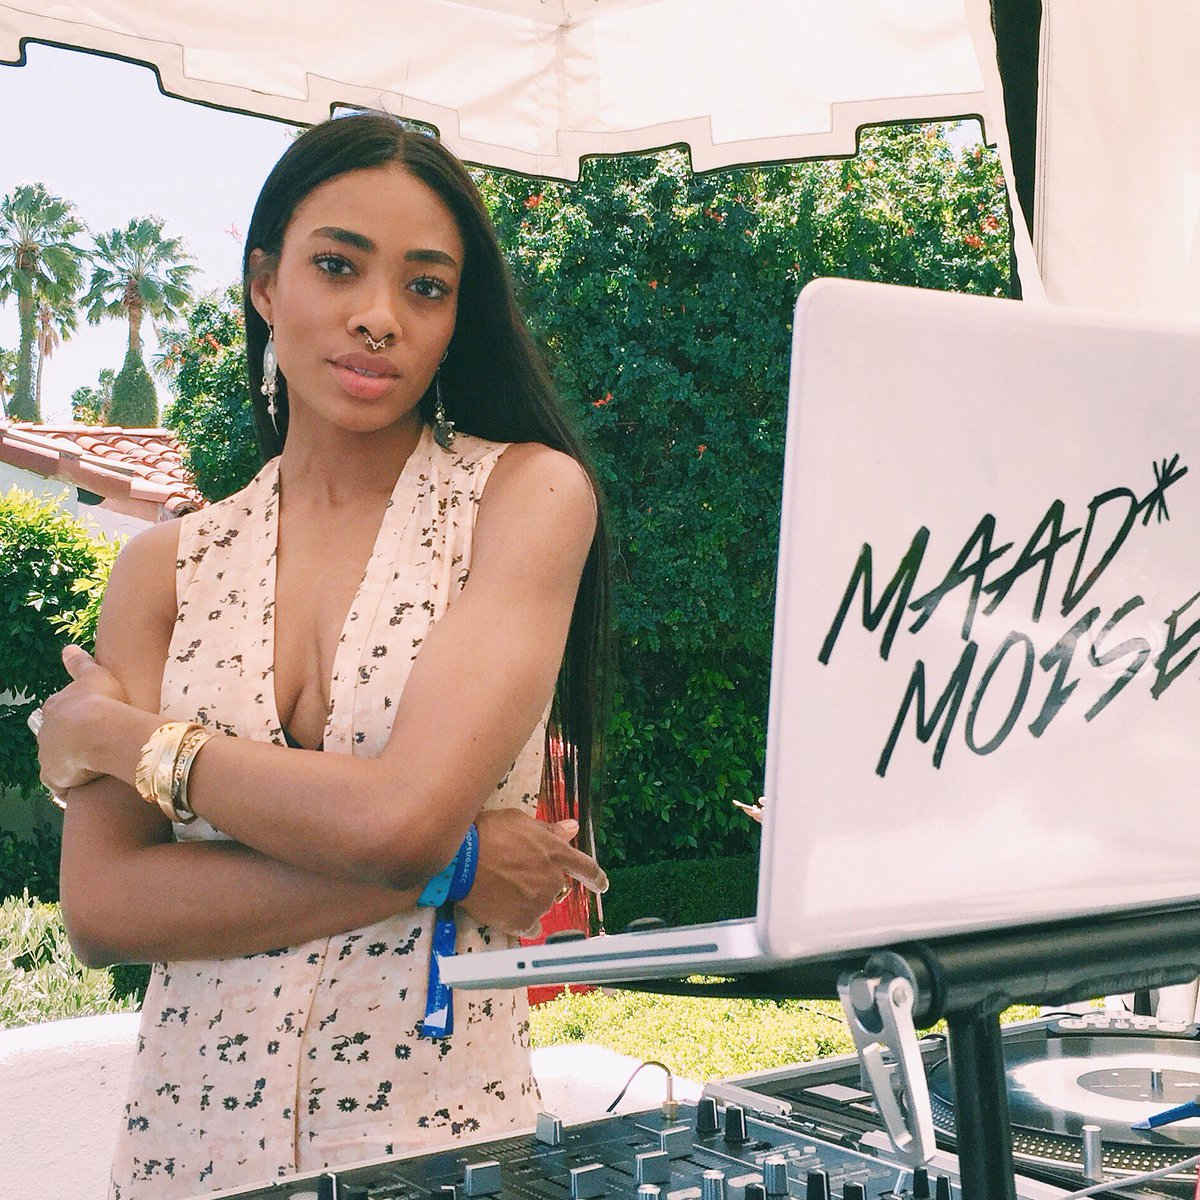 DJ @maad_moiselle At The @popsugar Event // Feather Cuff & Aquarian Cuff As A Septum Ring #camjewelry #coachella https://t.co/5EF1UAeK2E